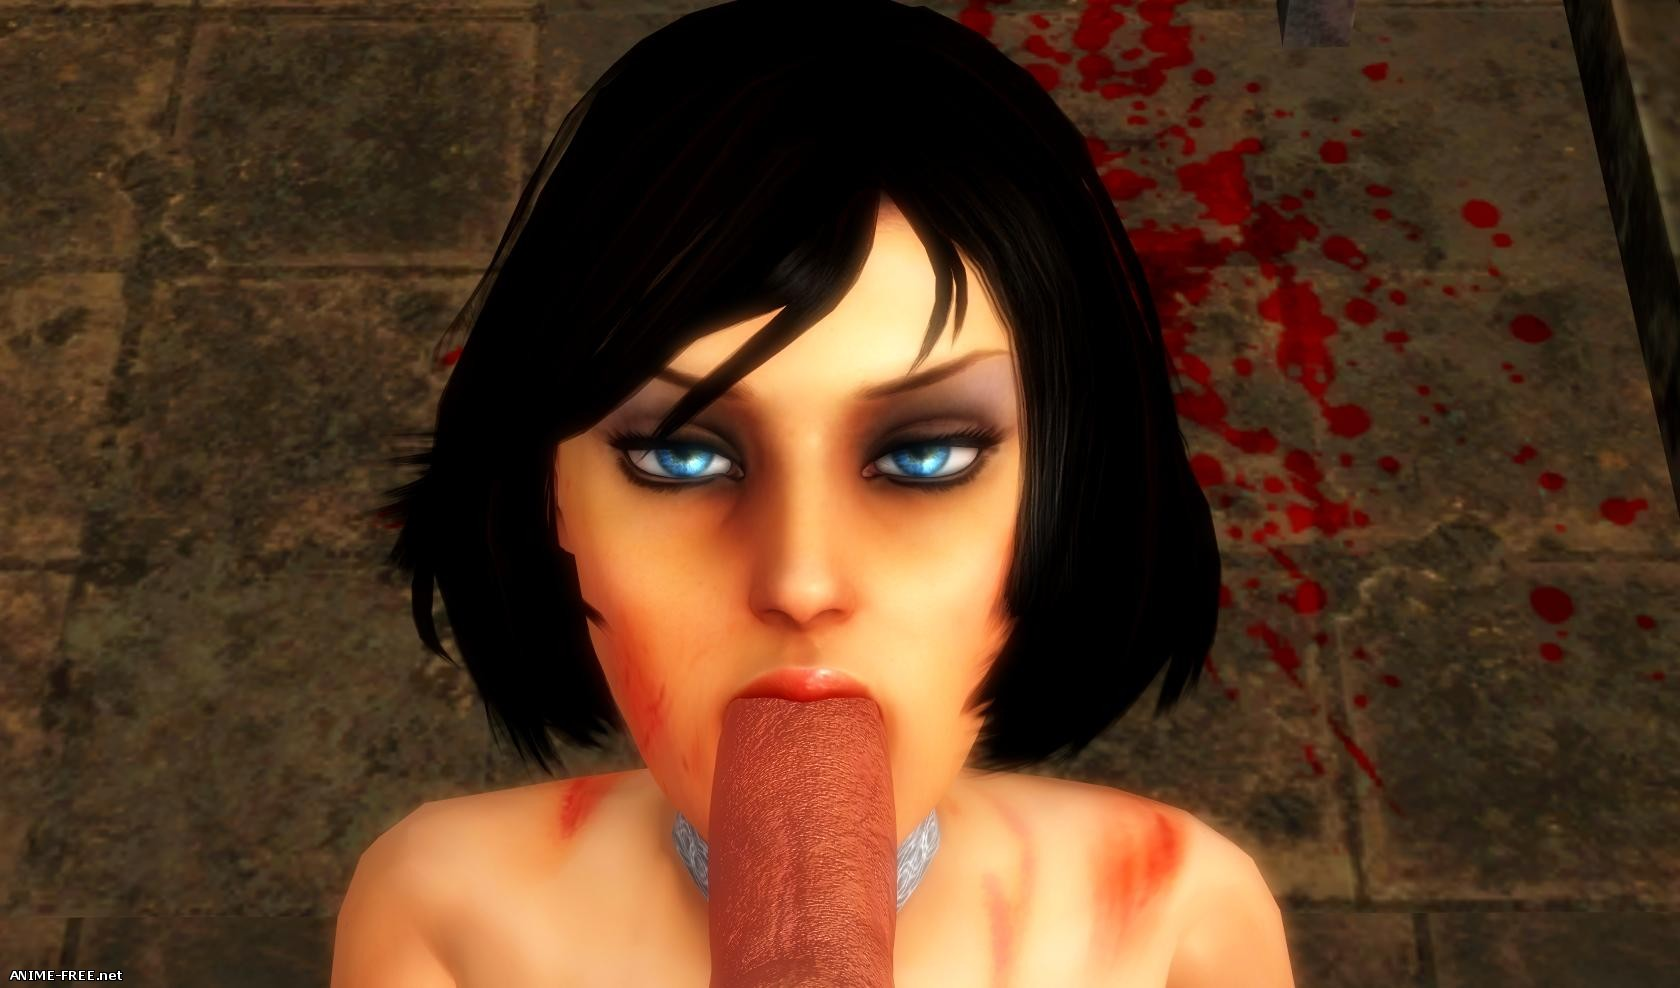 Bioshock Infinite - Elizabeth [Ptcen] [JPG,PNG,GIF] Hentai ART